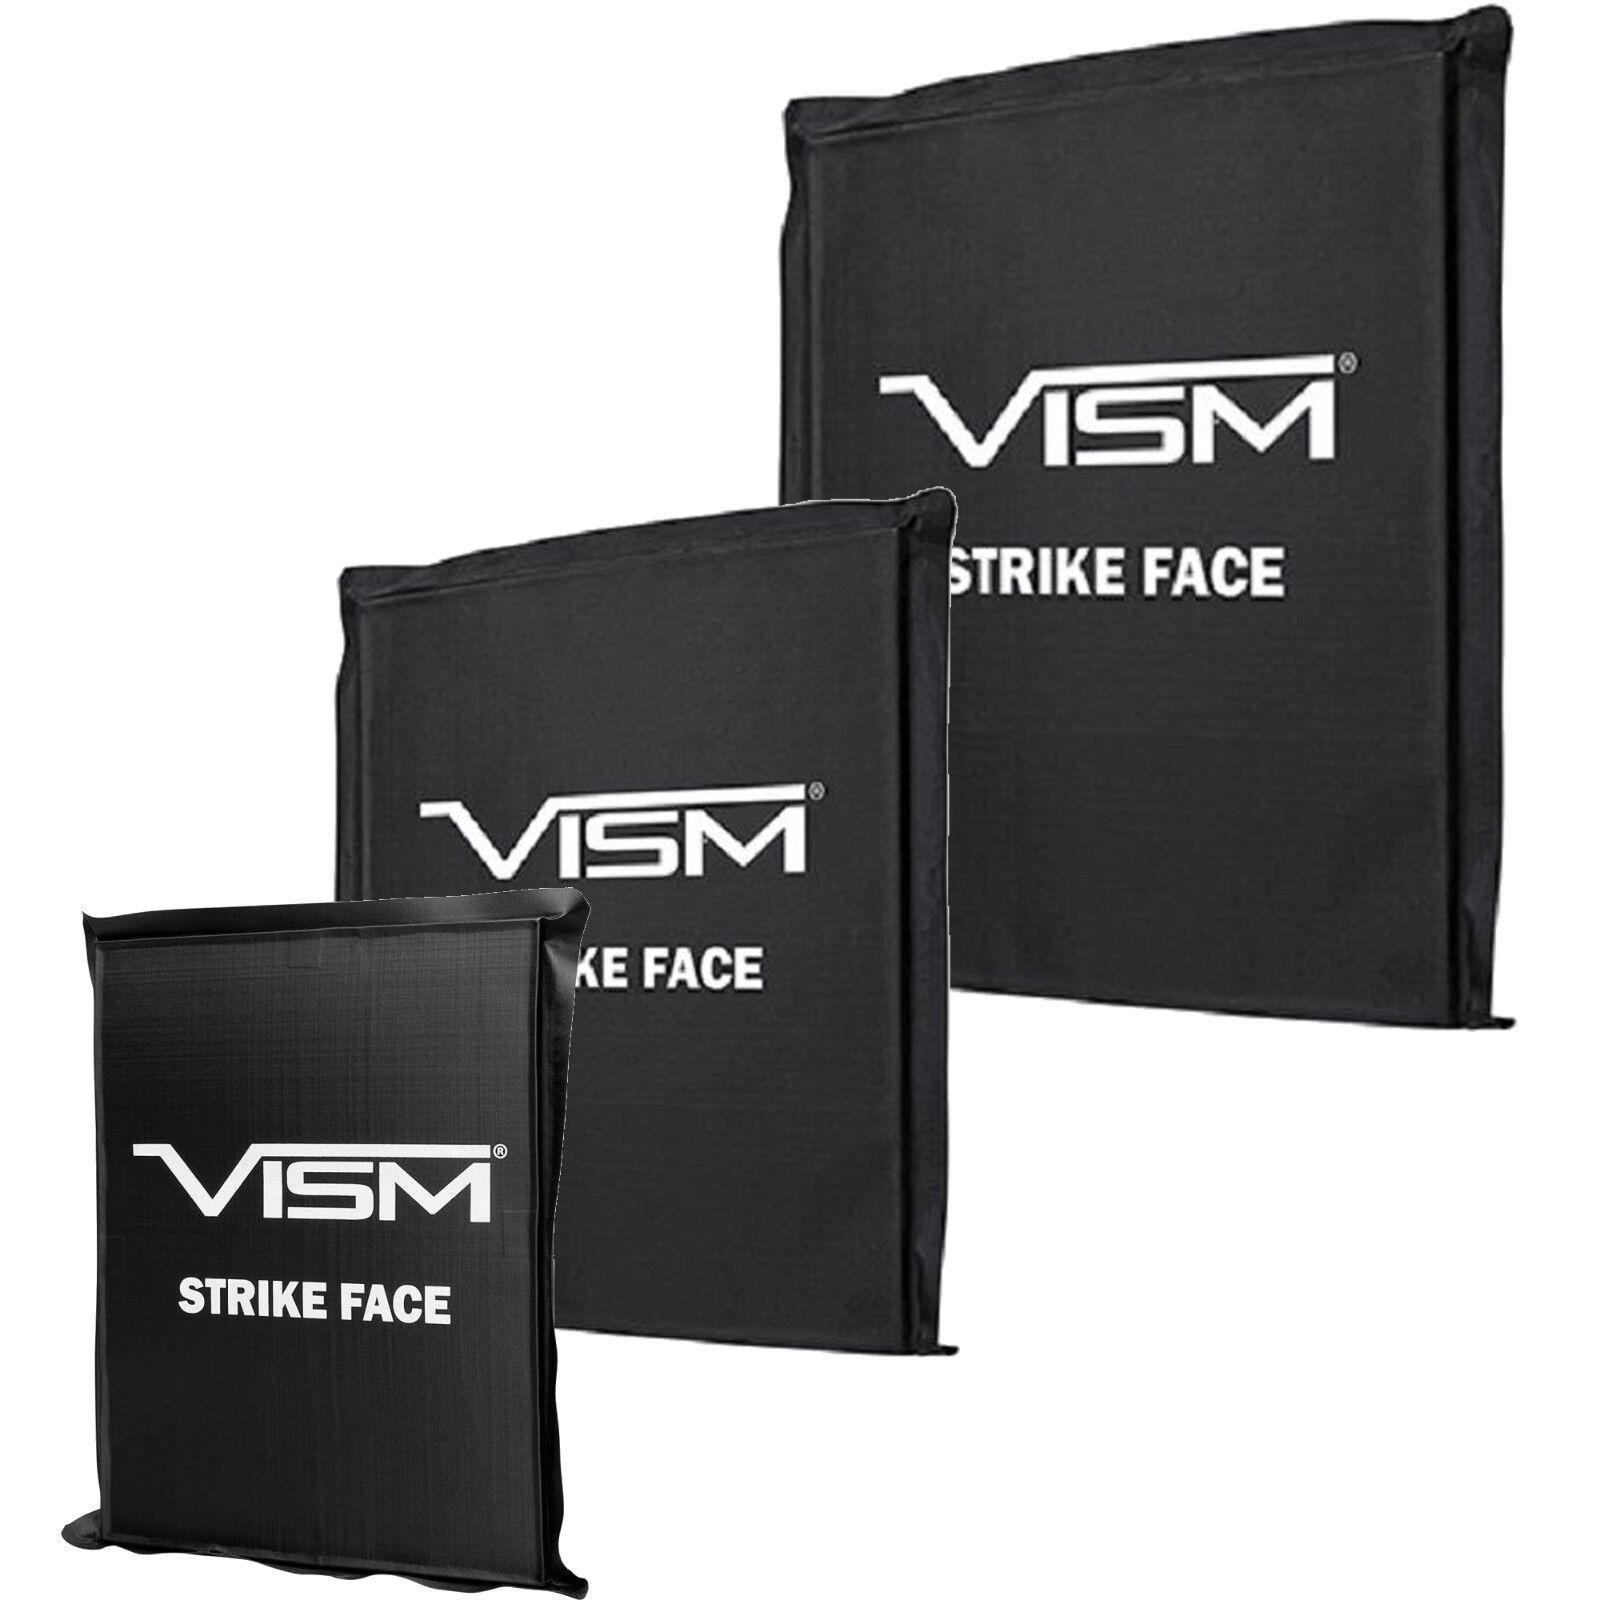 VISM Level IIIA UHMWPE Ballistic Tactical Soft Body Armor Panel - Rectangle Cut